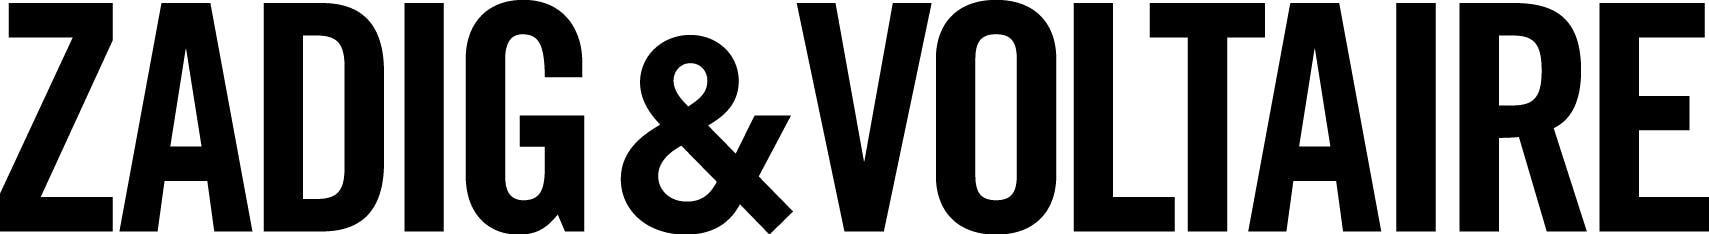 Zadig & Voltaire company logo